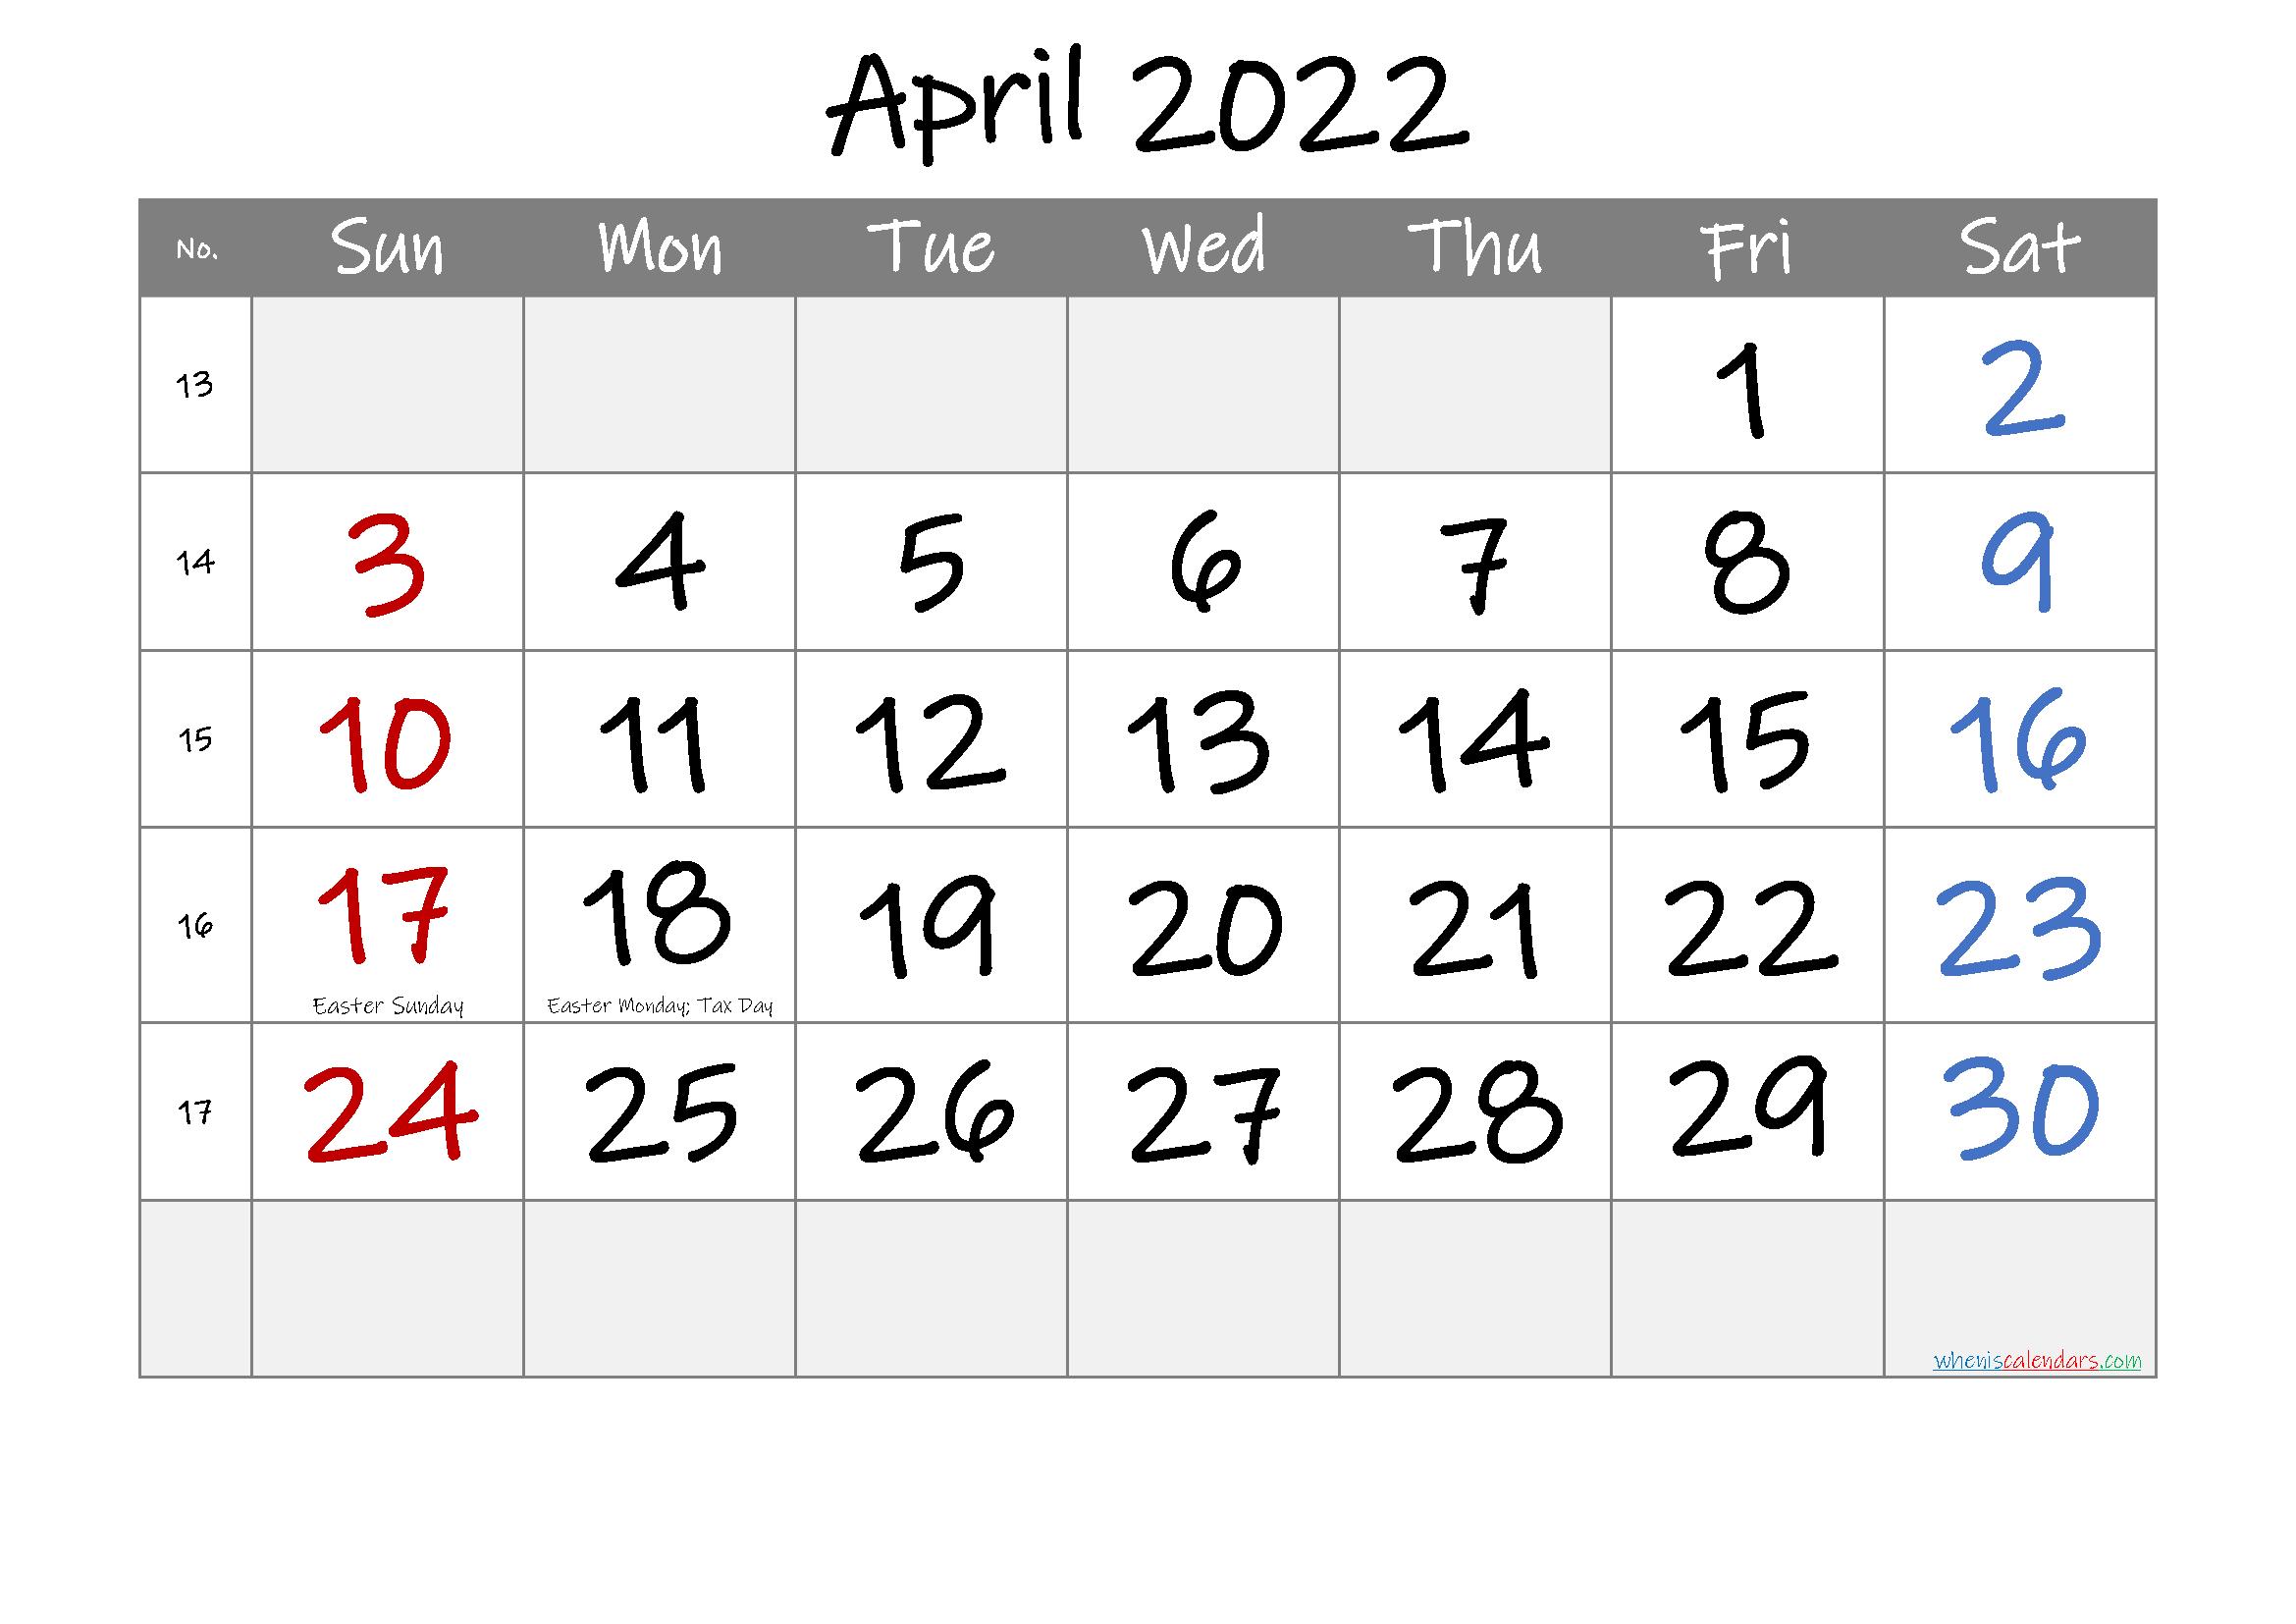 April 2022 Free Printable Calendar-Template No.if22M28 within April May Calendar 2022 Pdf Photo